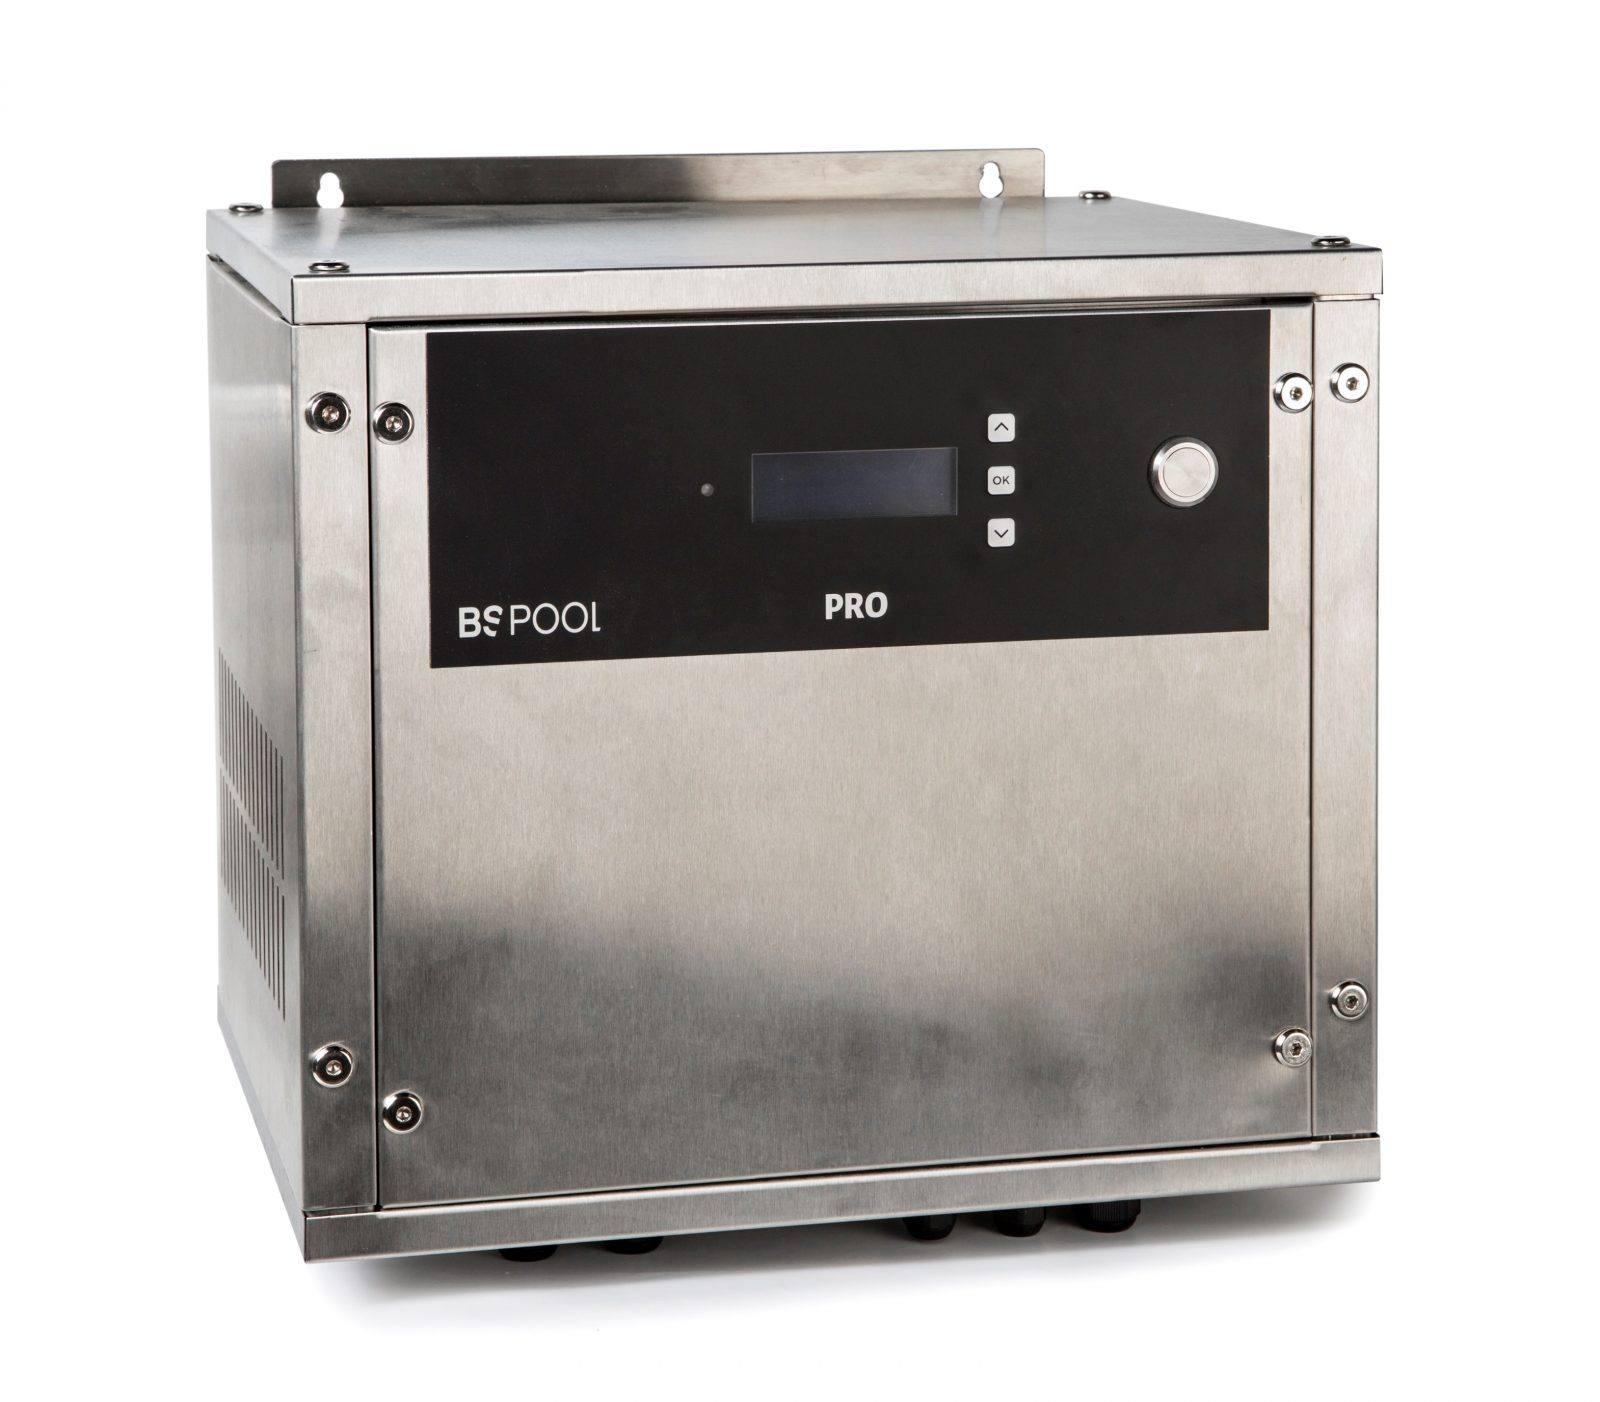 Clorador industrial BSPOOL PRO 200